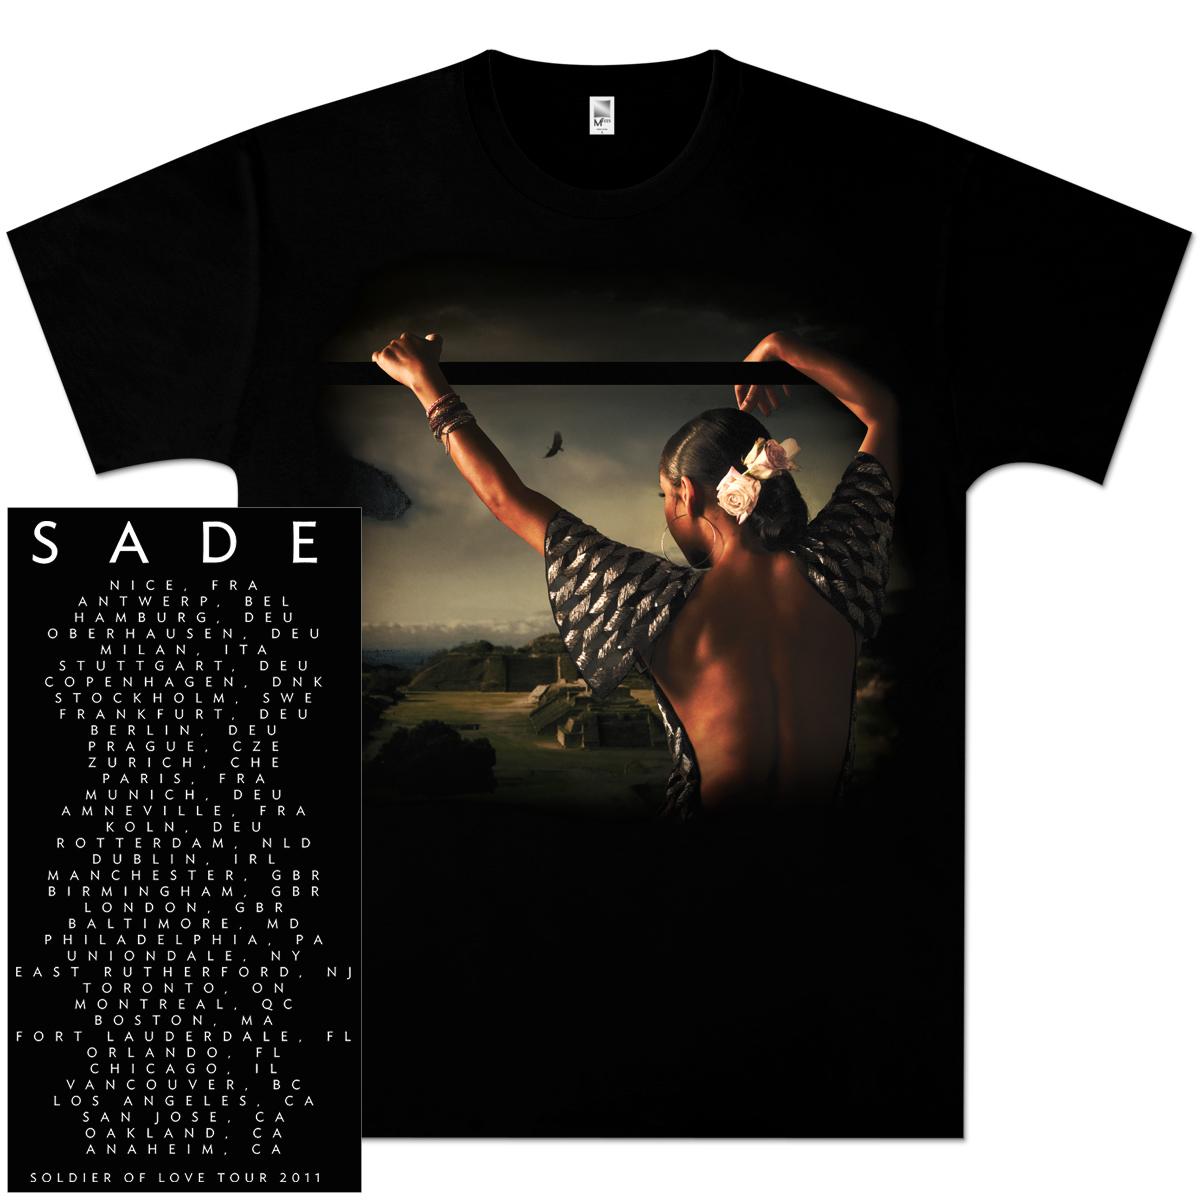 Sade Premonition 2011 Tour T-Shirt